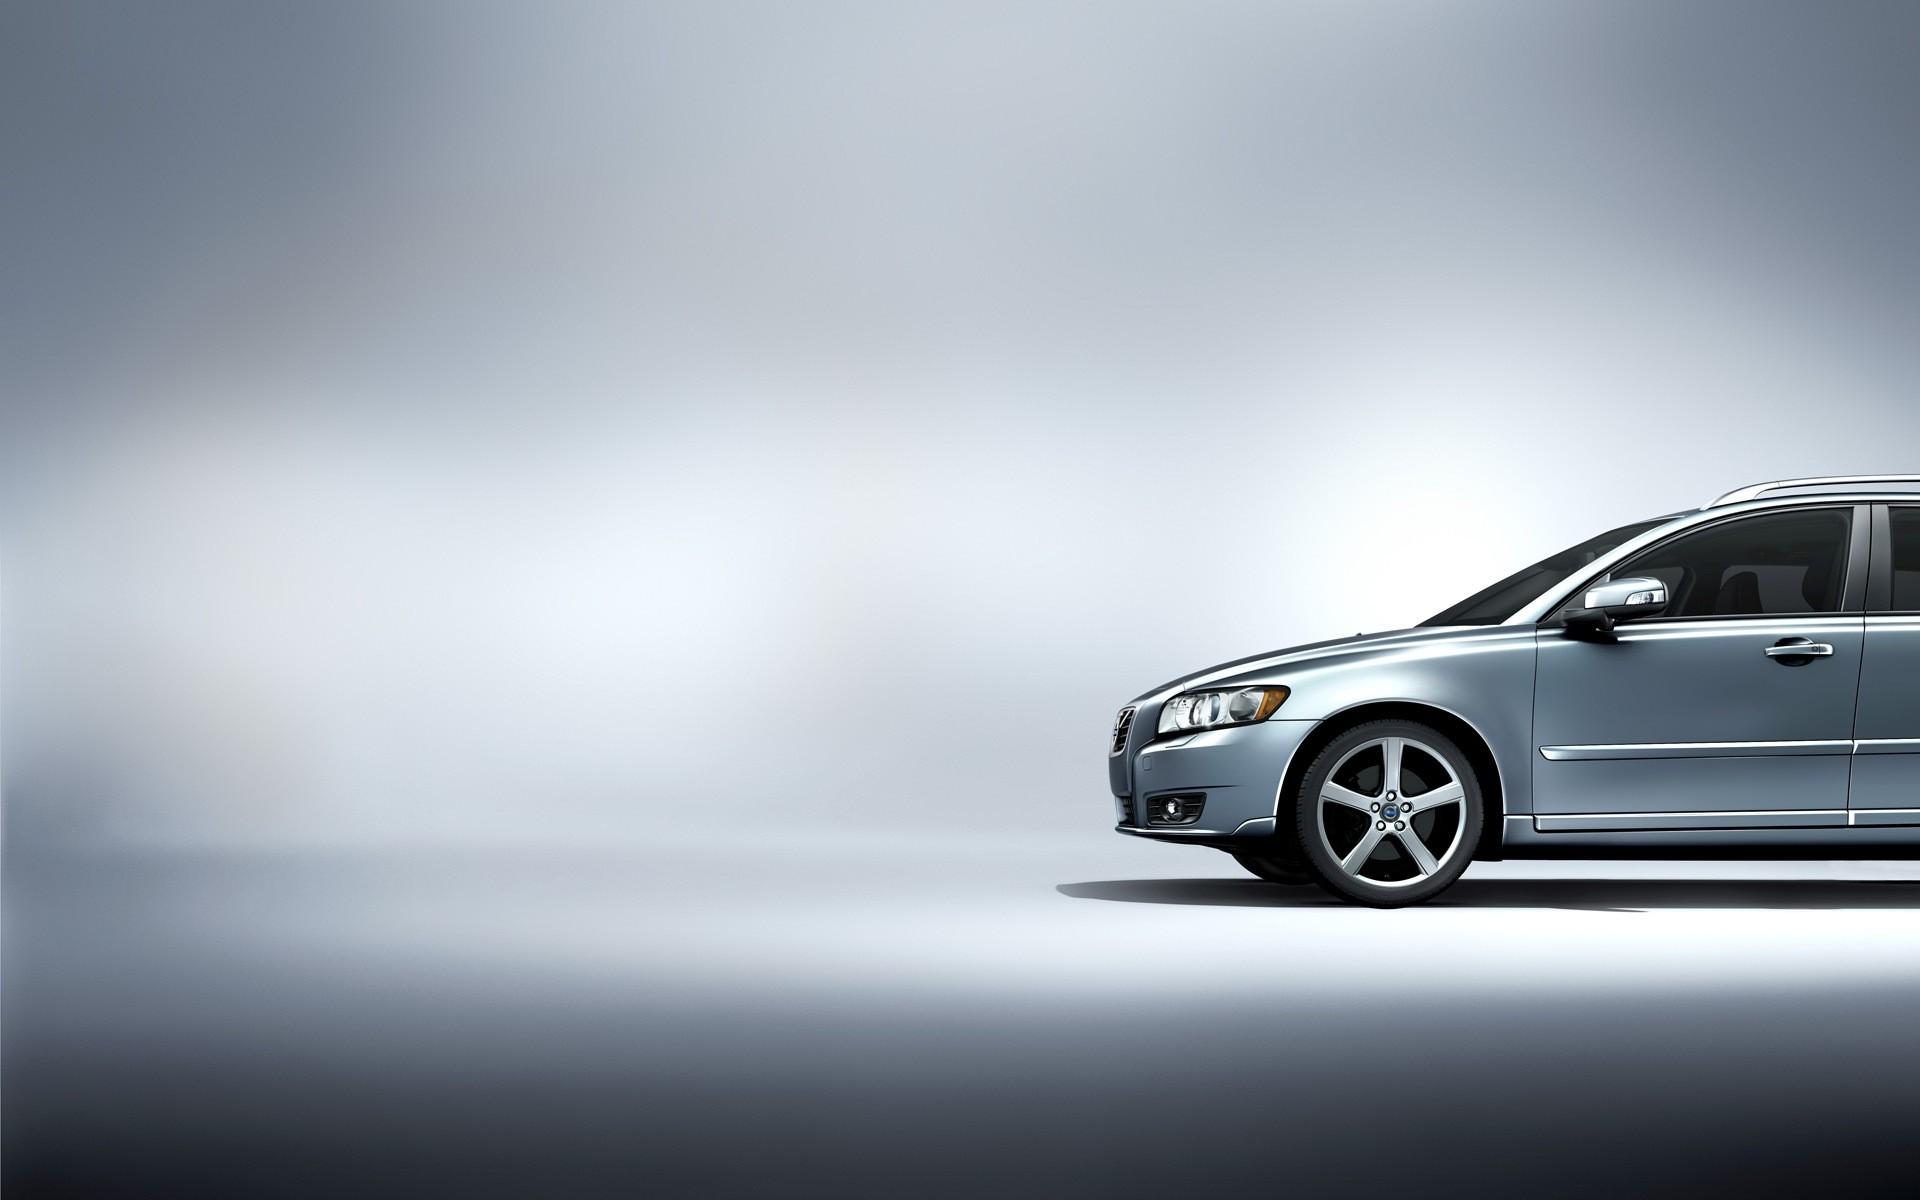 Car Background Download Free Stunning Hd Backgrounds For Desktop